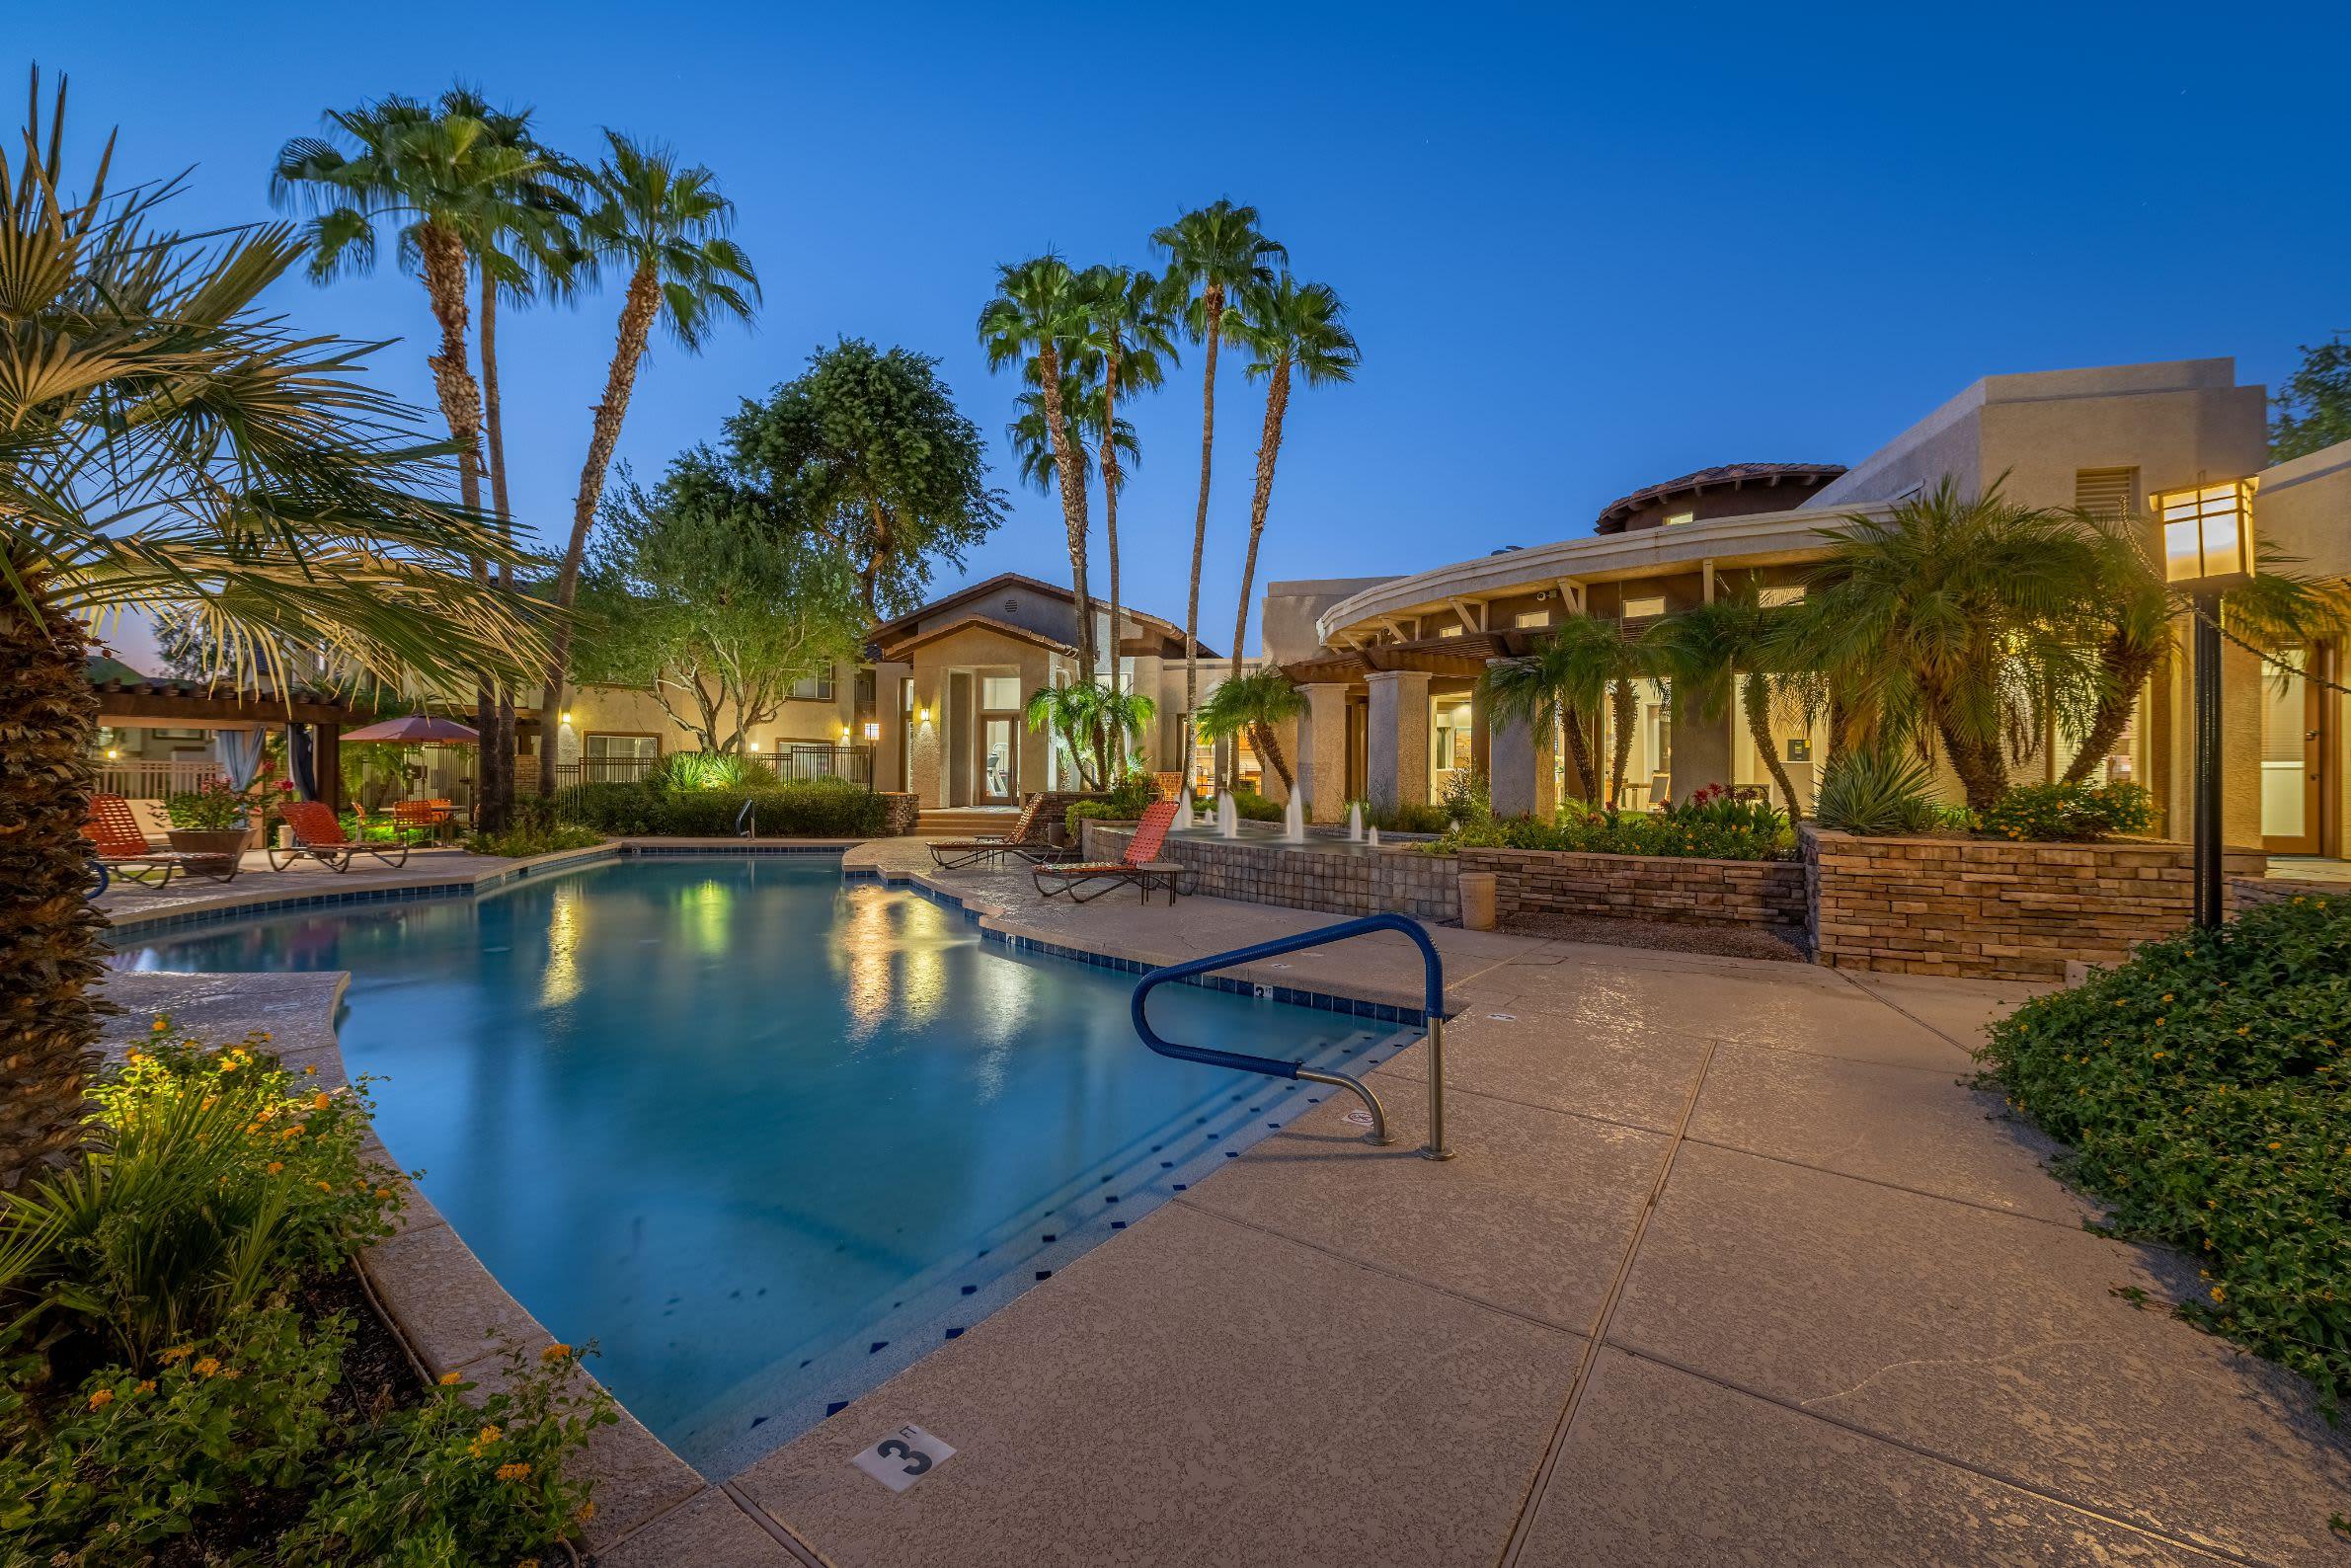 Resort style pool at dusk Azure Creek in Cave Creek, Arizona